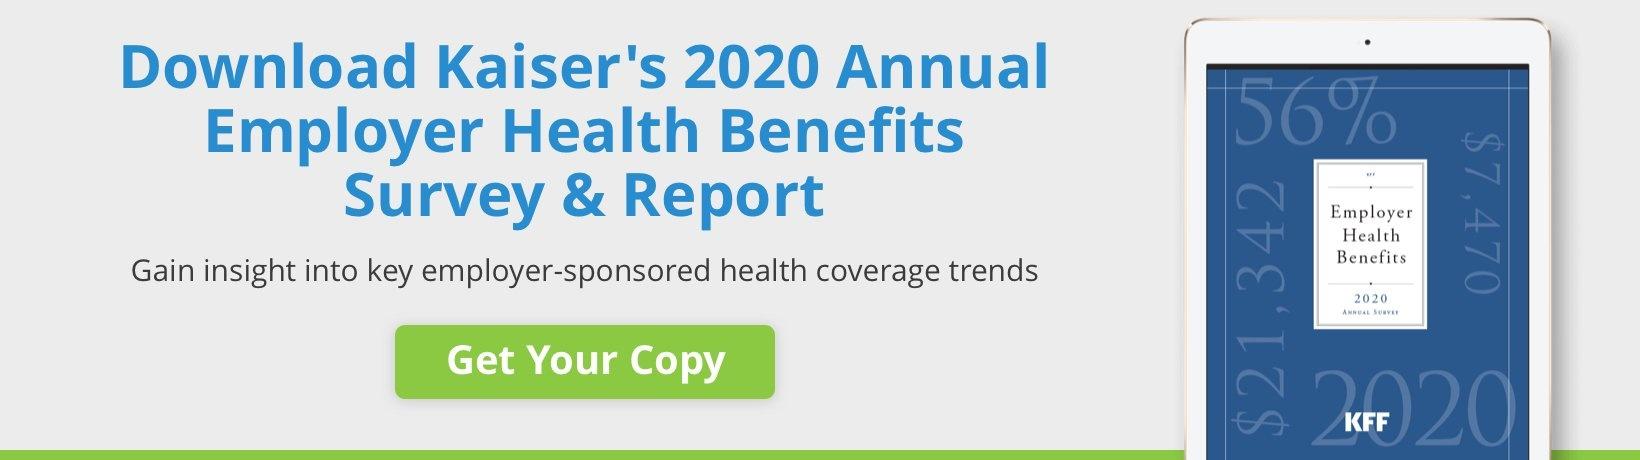 Kaiser's 2020 Annual Employer Health Benefits Survey & Report Download